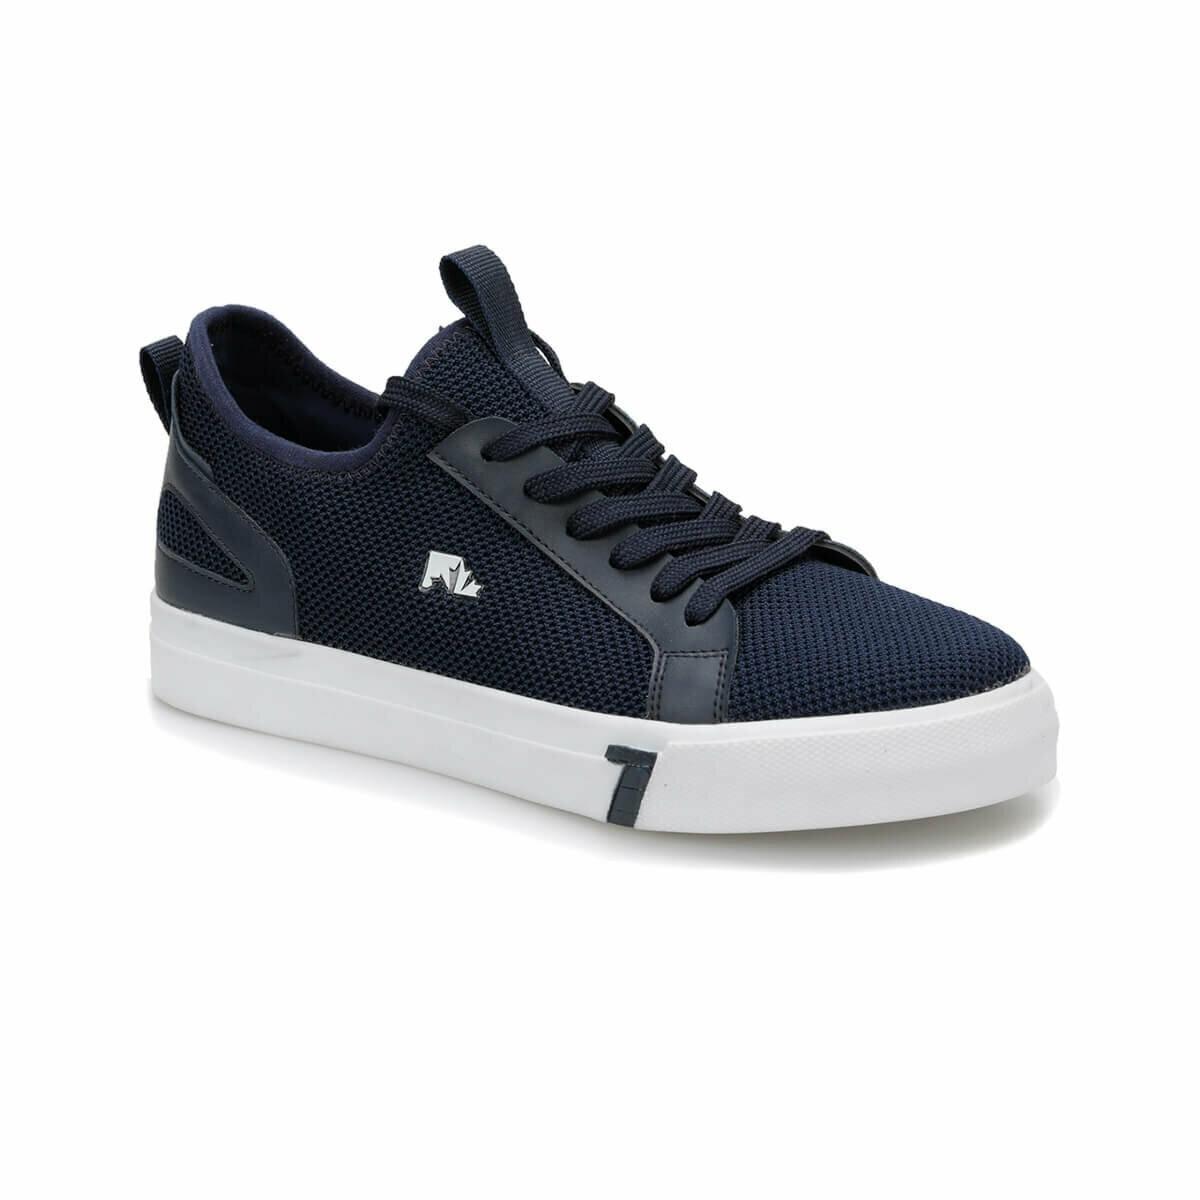 FLO NAPOLI Navy Blue Men 'S Sneaker Shoes LUMBERJACK